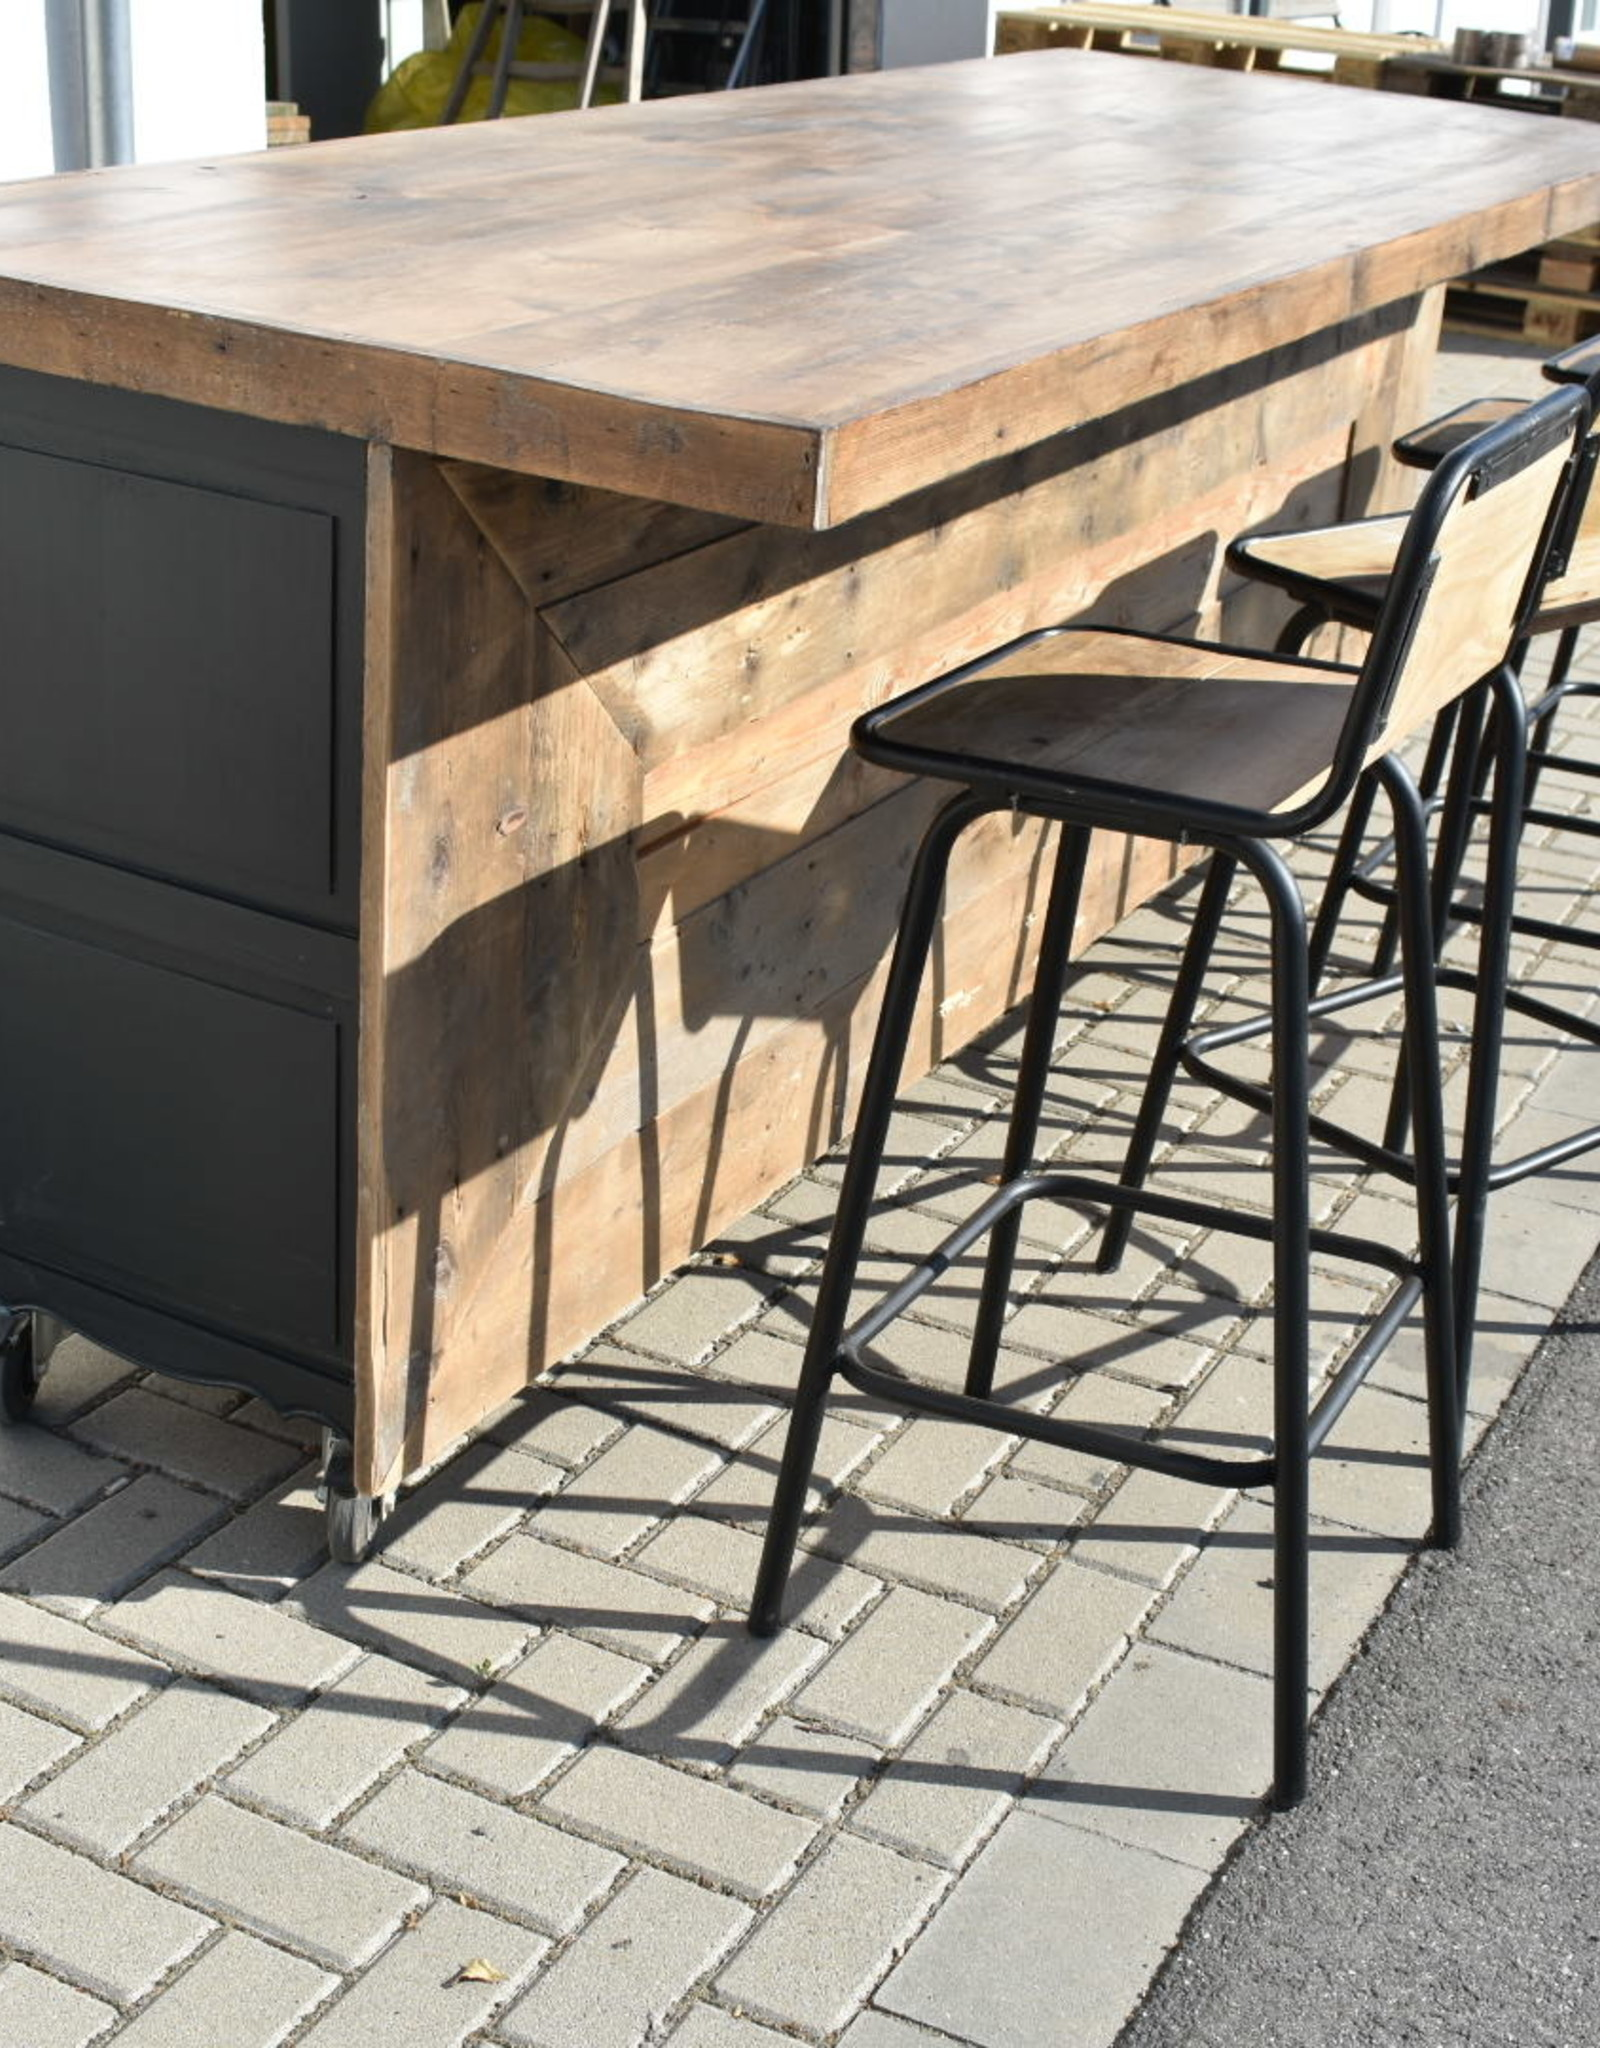 Vintage Keukeneiland / Bar